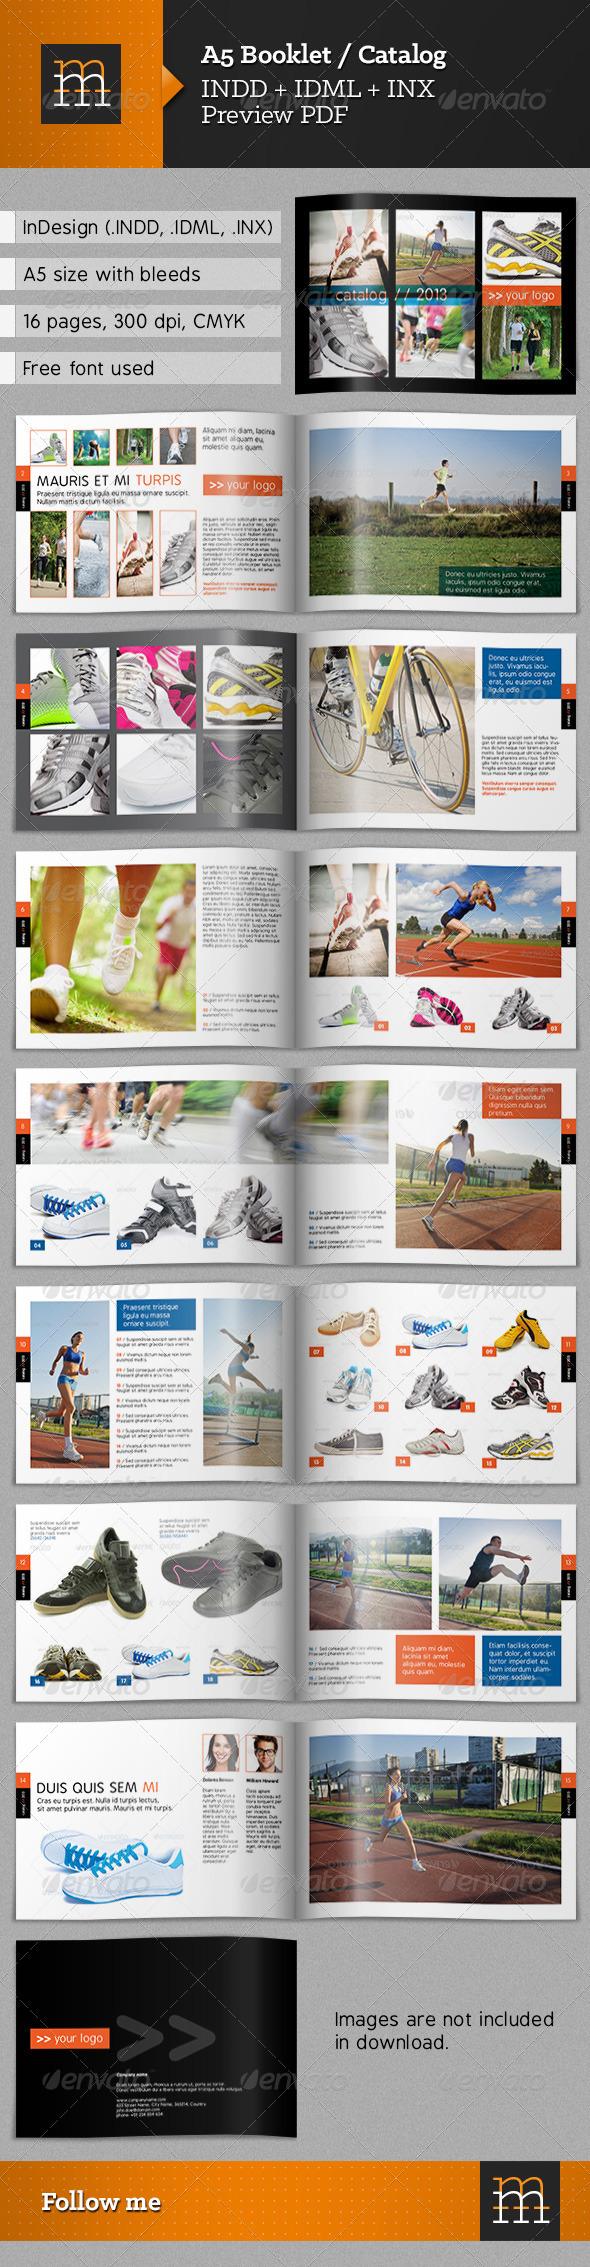 A5 Booklet / Catalog - Catalogs Brochures